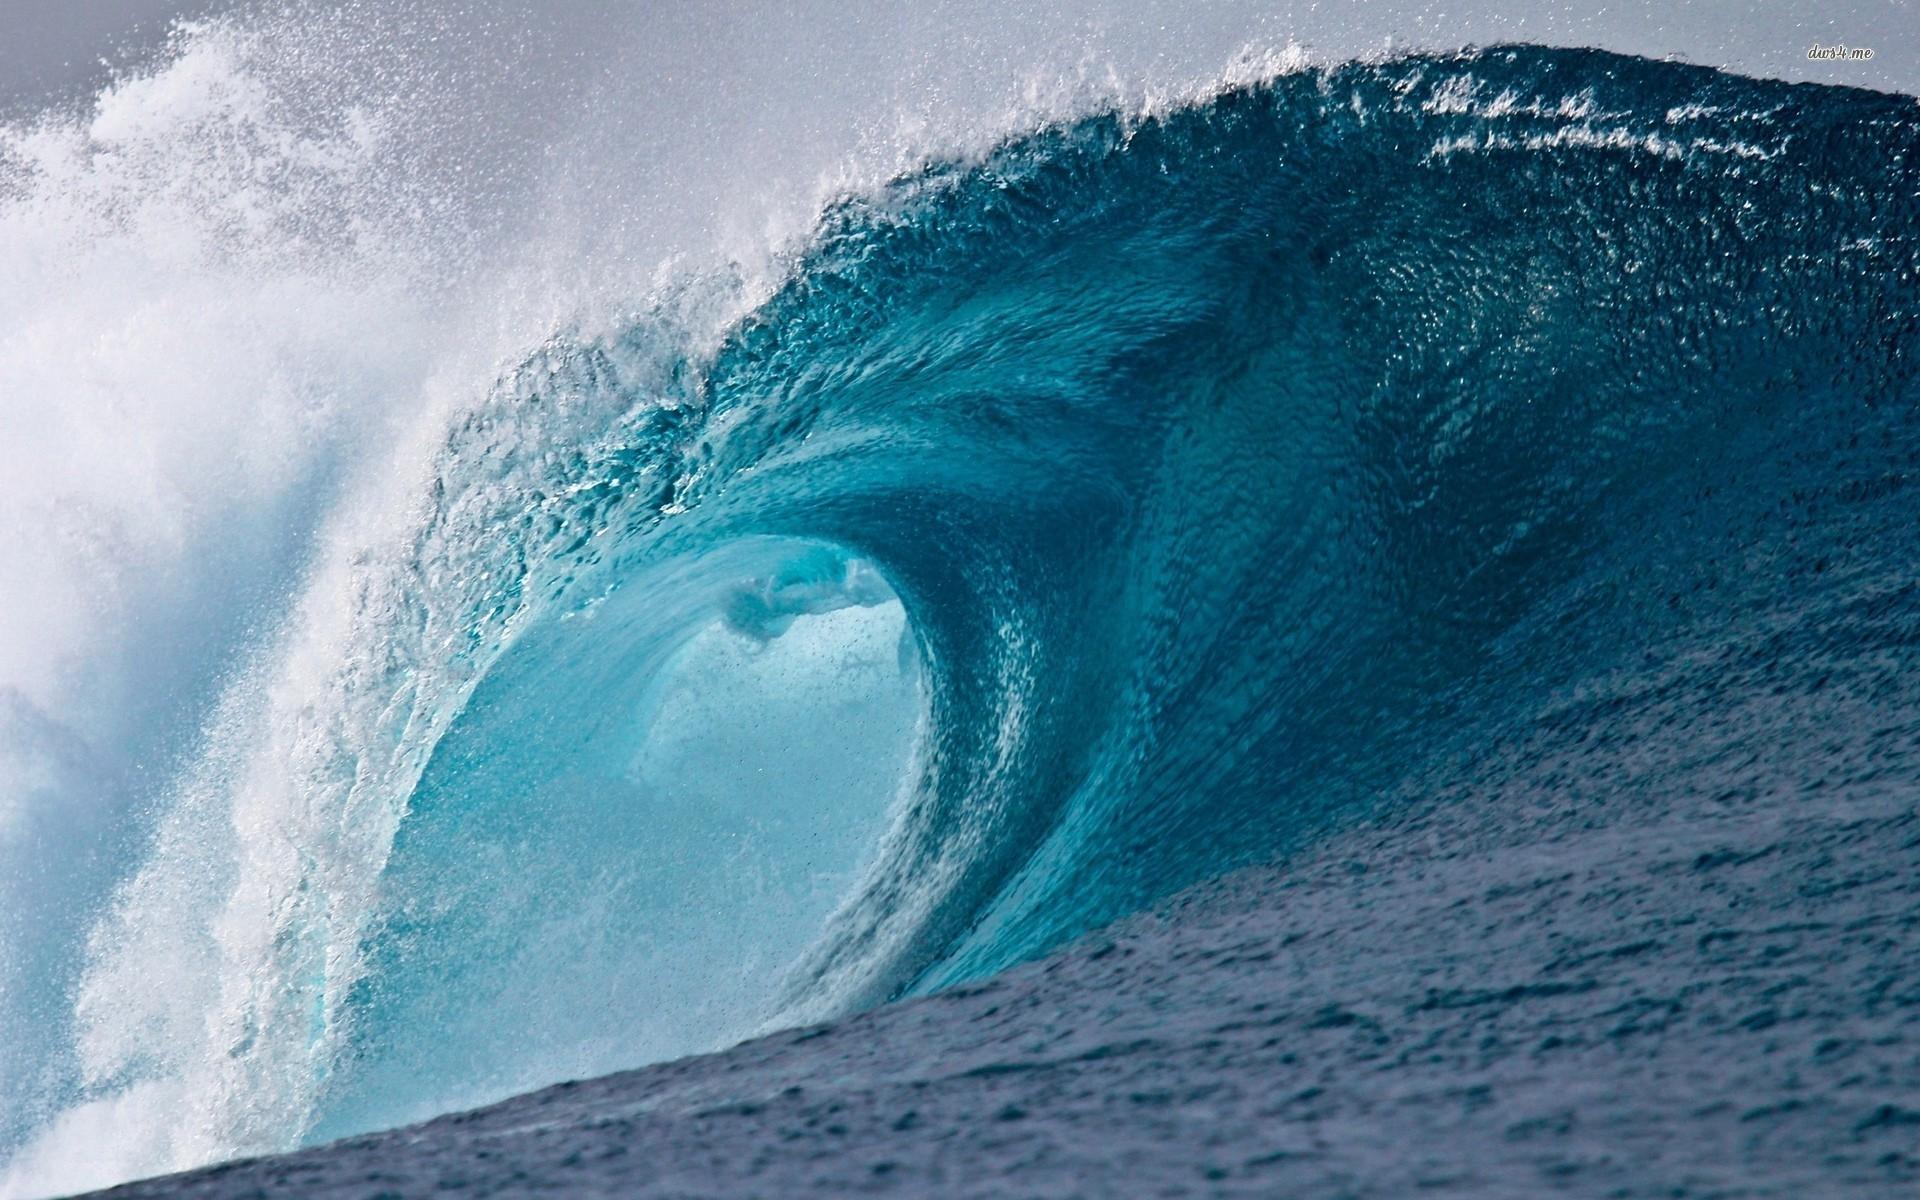 Apple Iphone X Wallpaper Download Beach Waves Wallpapers For Desktop 55 Images